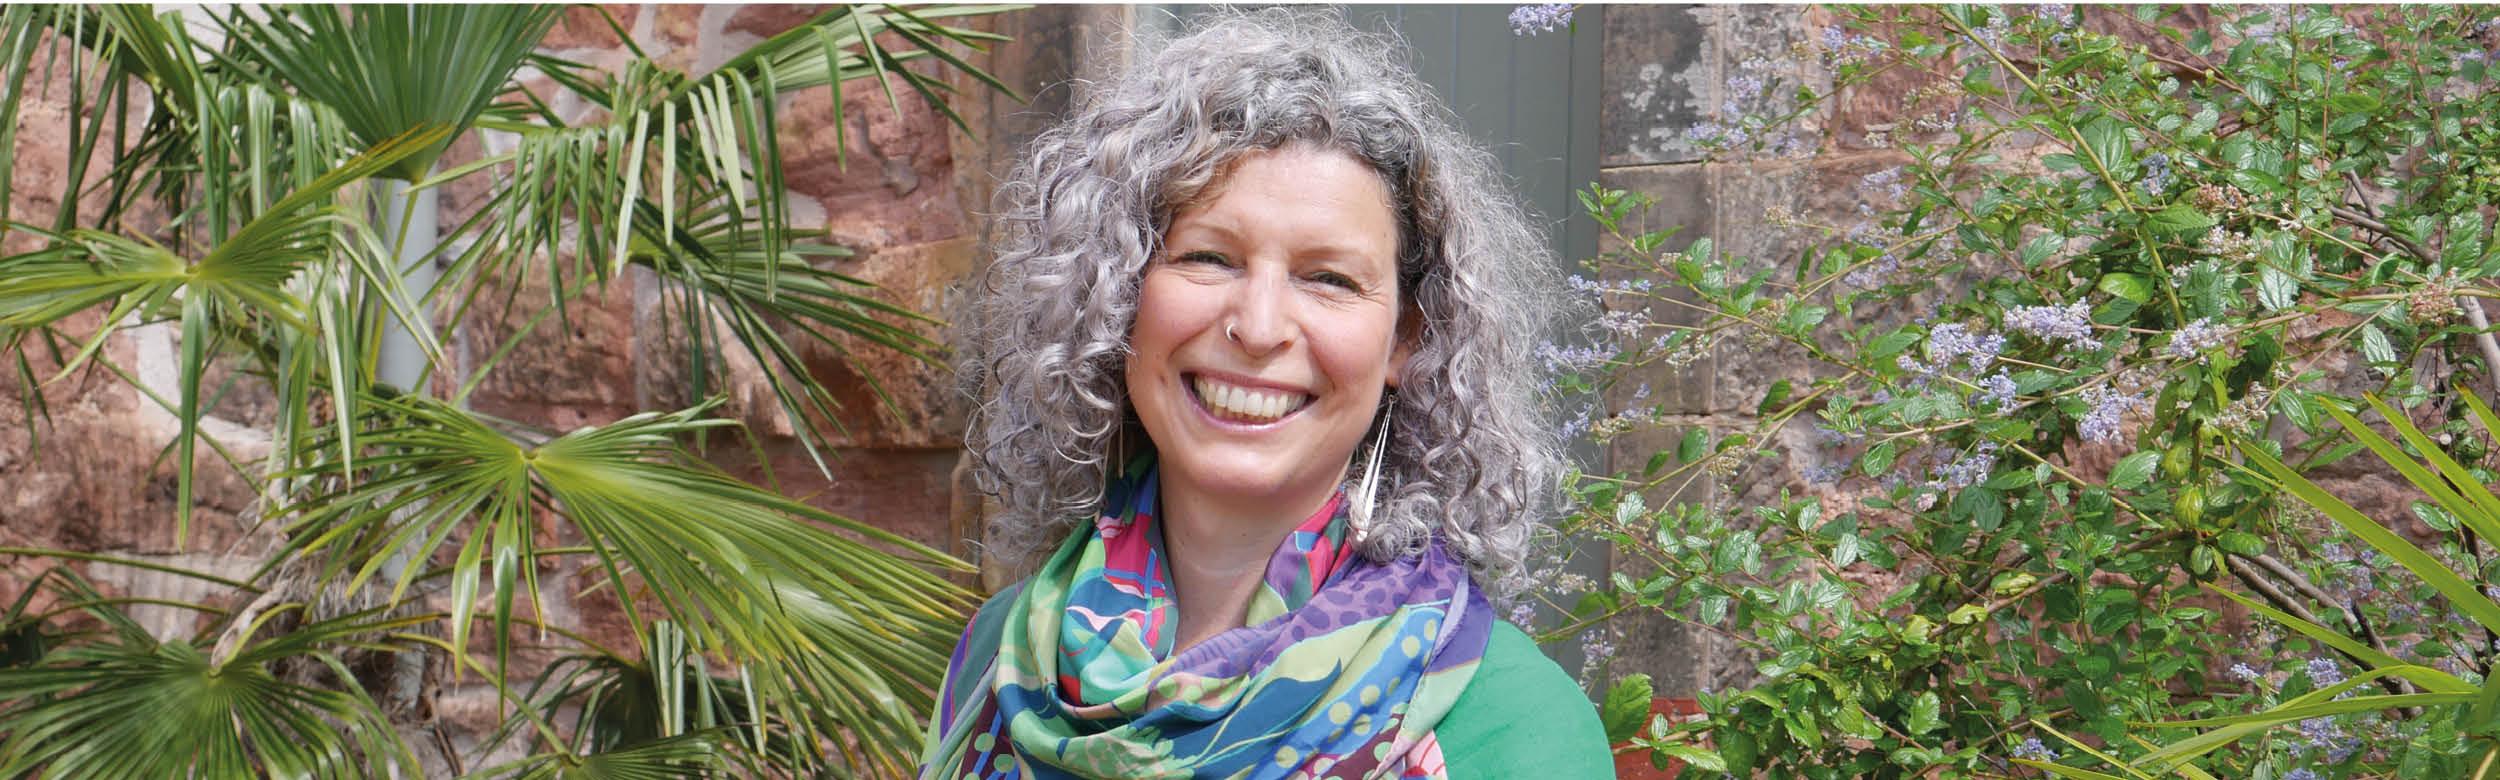 Join Jen Wood's Mindfulness Meditation Class online at Restoration Yard